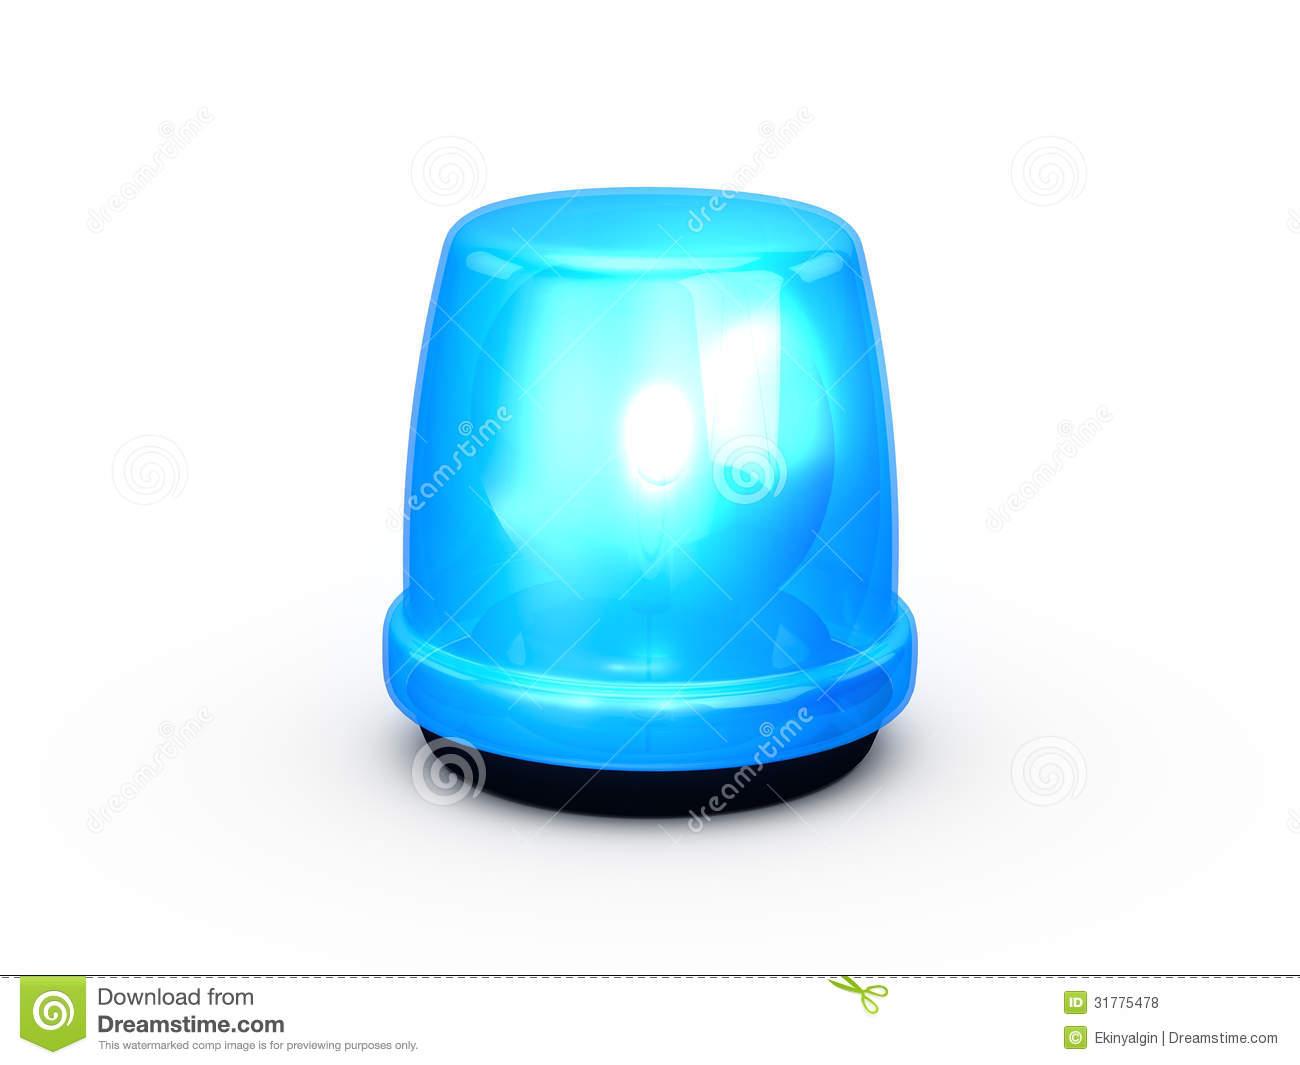 Flashing police car lights clipart image freeuse stock Blue Police Light Stock Illustrations – 511 Blue Police Light ... image freeuse stock